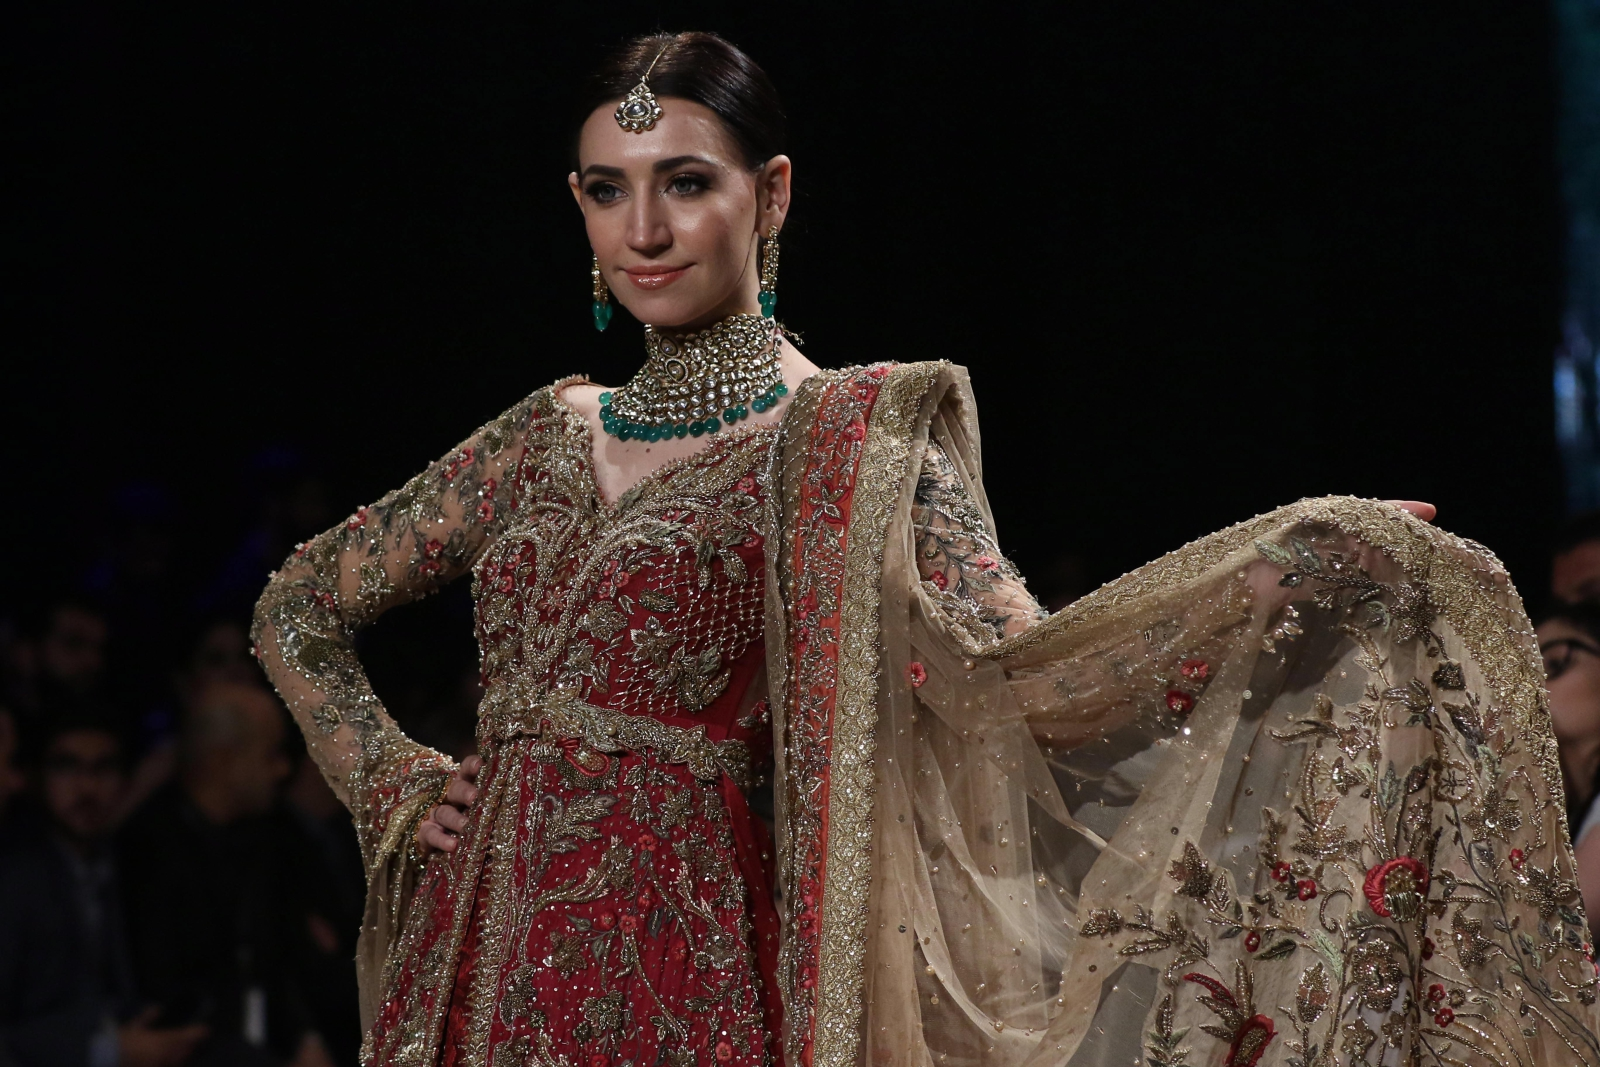 Pakistan Fashion Week EPA/RAHAT DAR